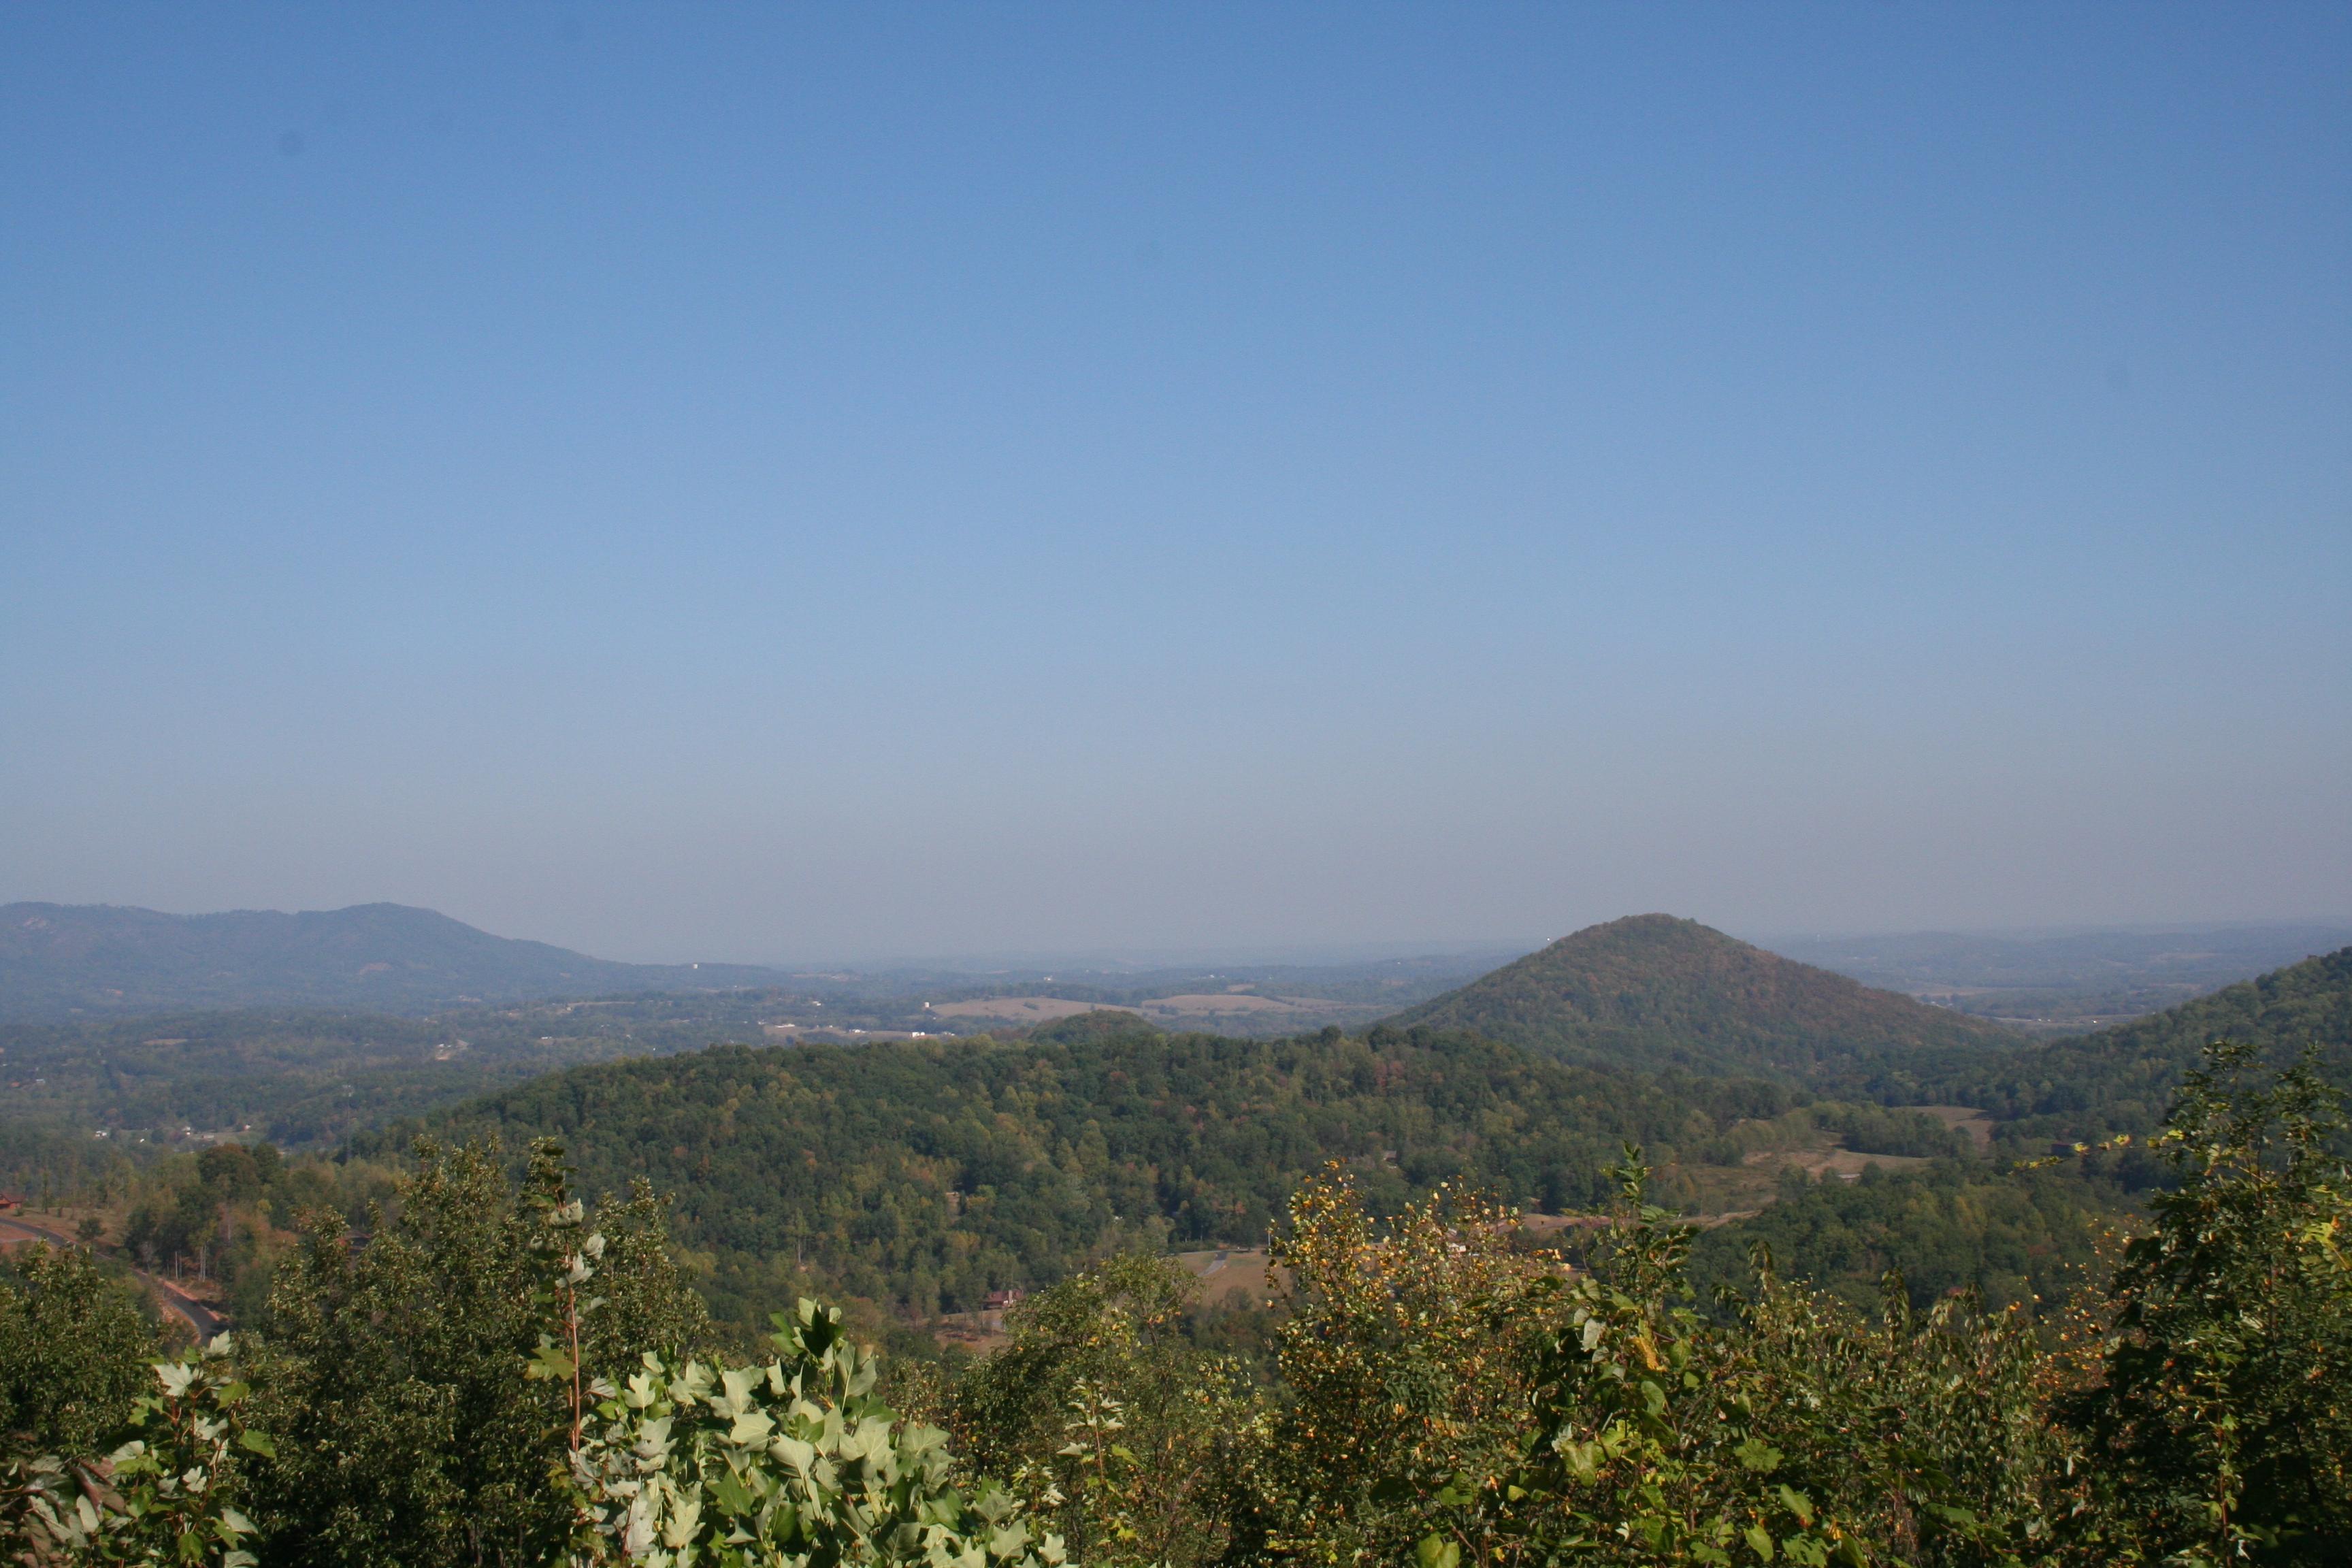 Newport / I-40 / Smoky Mountains KOA Journey image 22